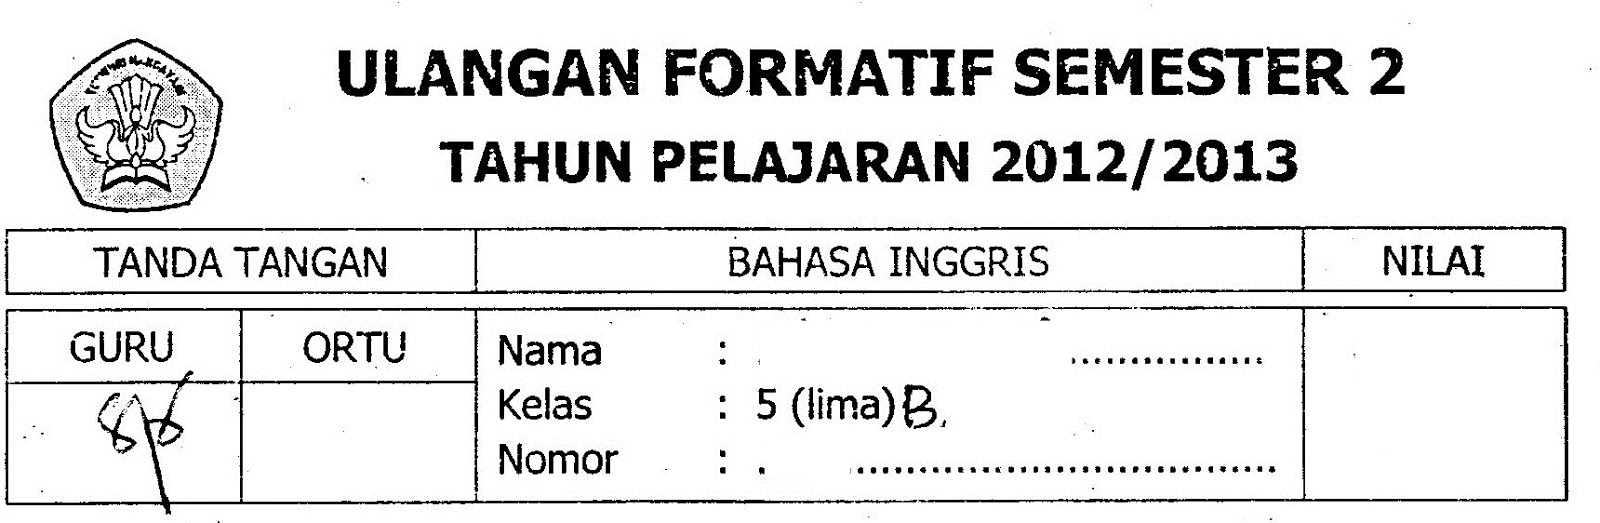 Inggris Kelas 5 Ulangan Formatif Semester 2 Ta 2012 2013 Sunarto S Kom